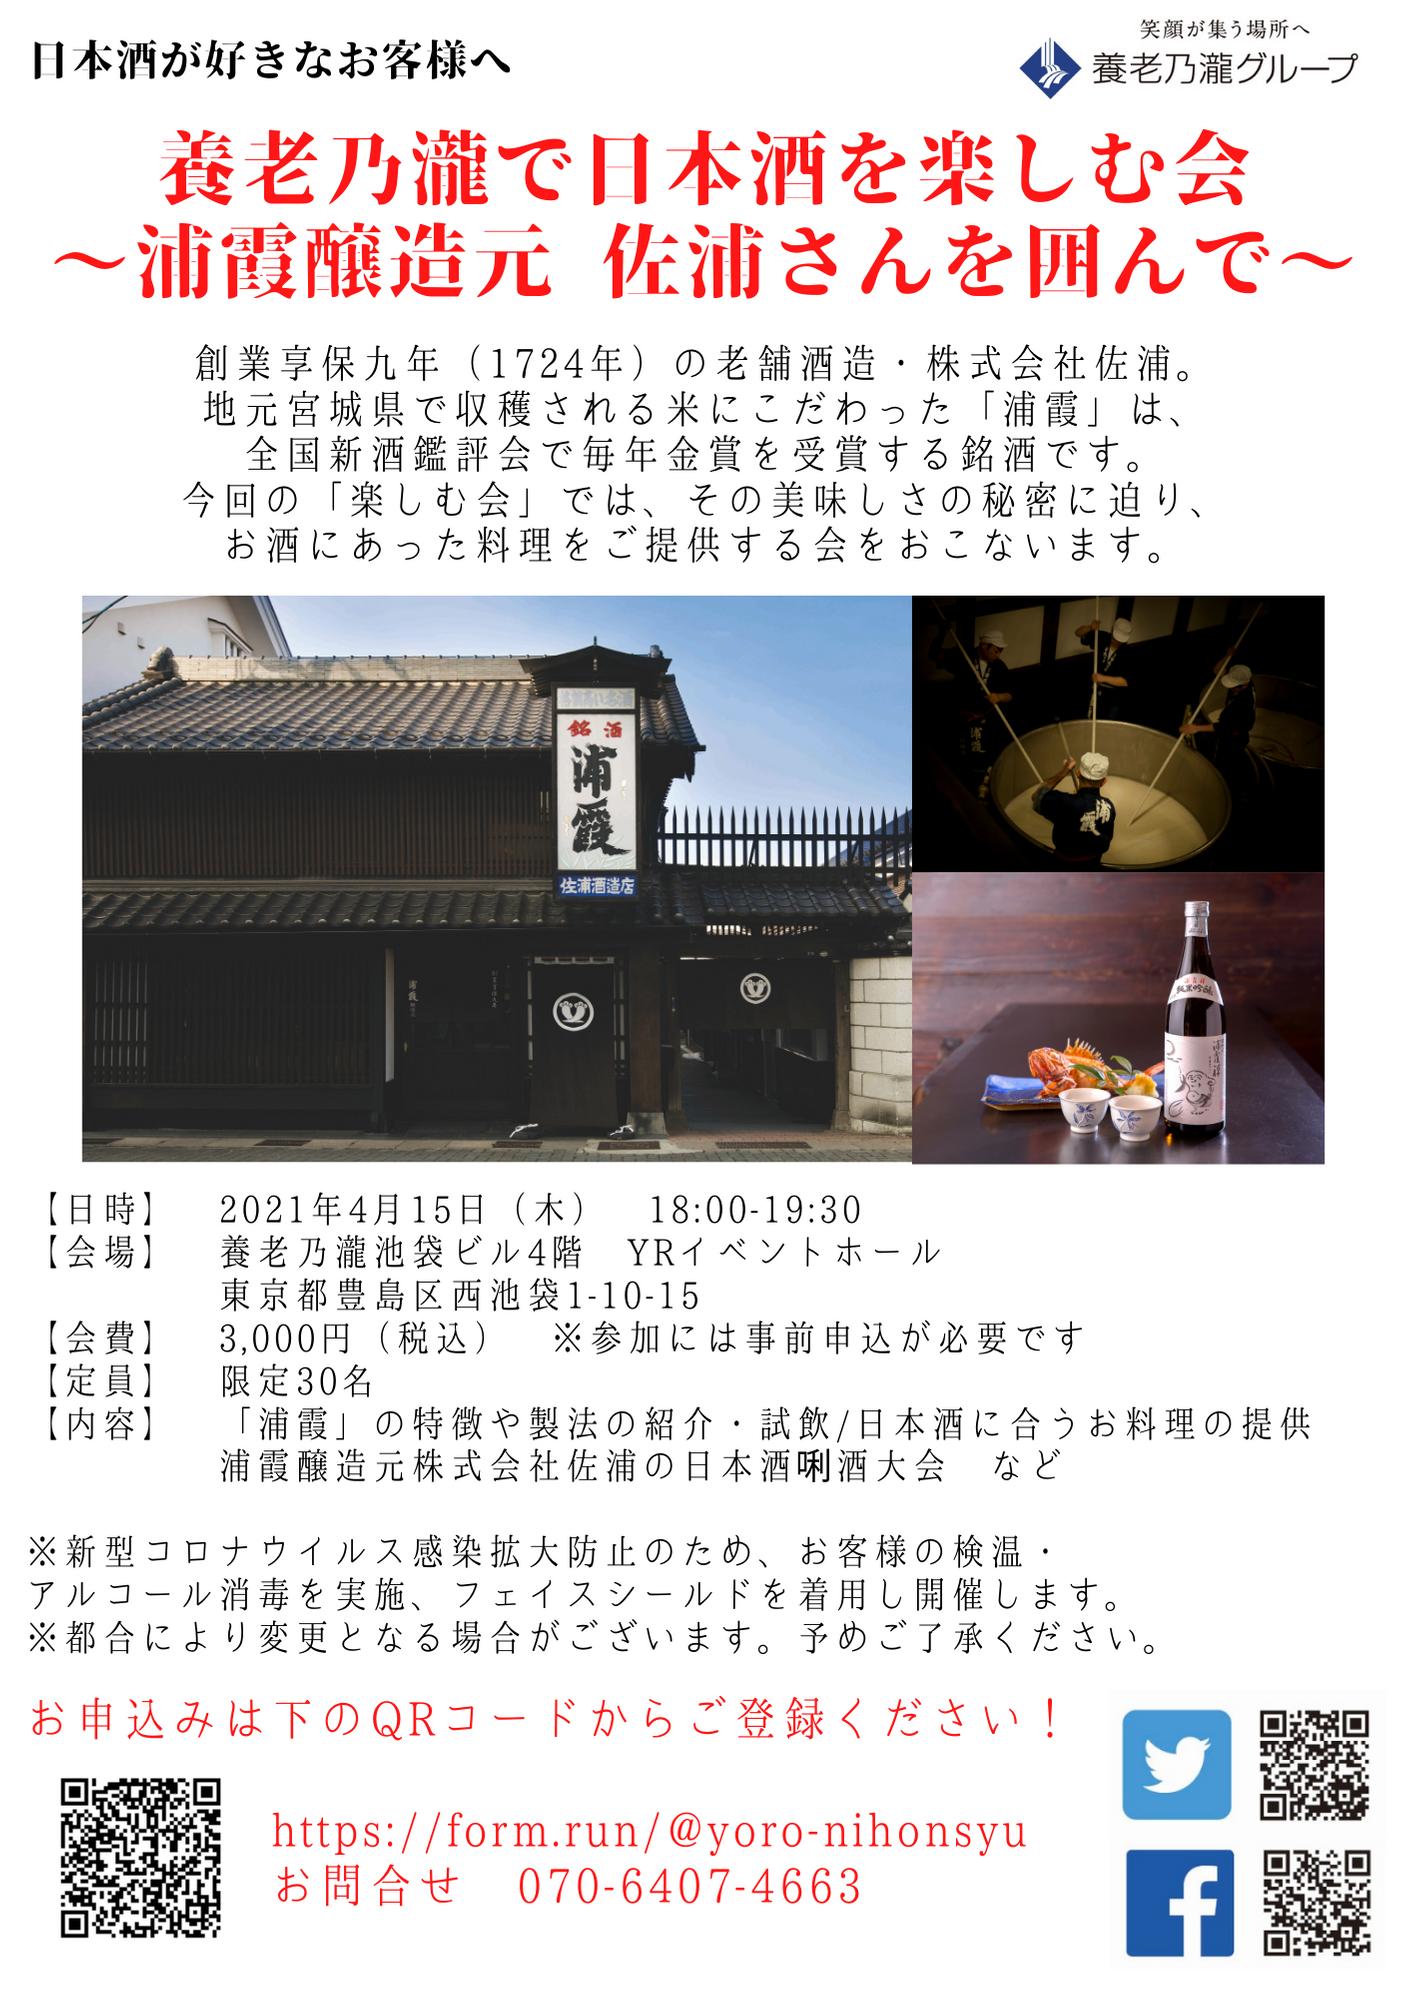 https://www.urakasumi.com/tayori/chirashi.png